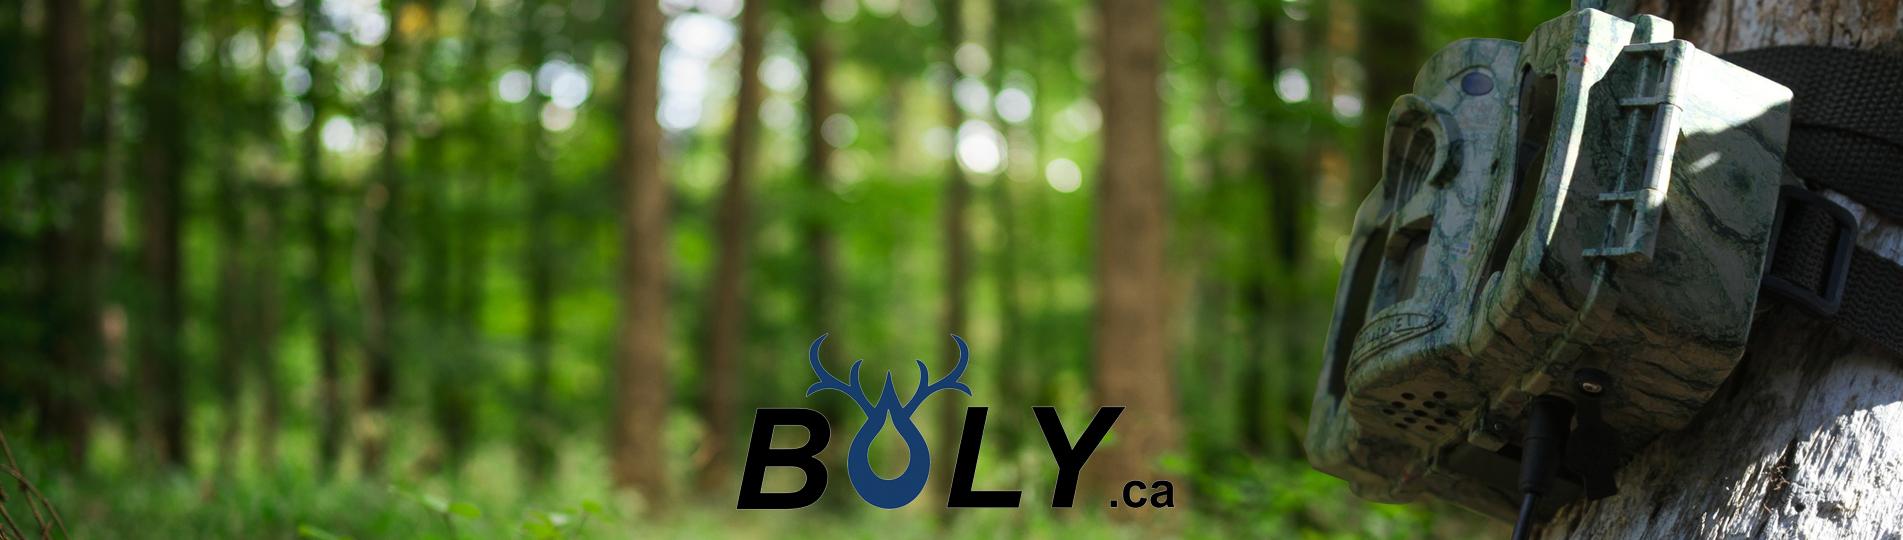 Boly trail camera new